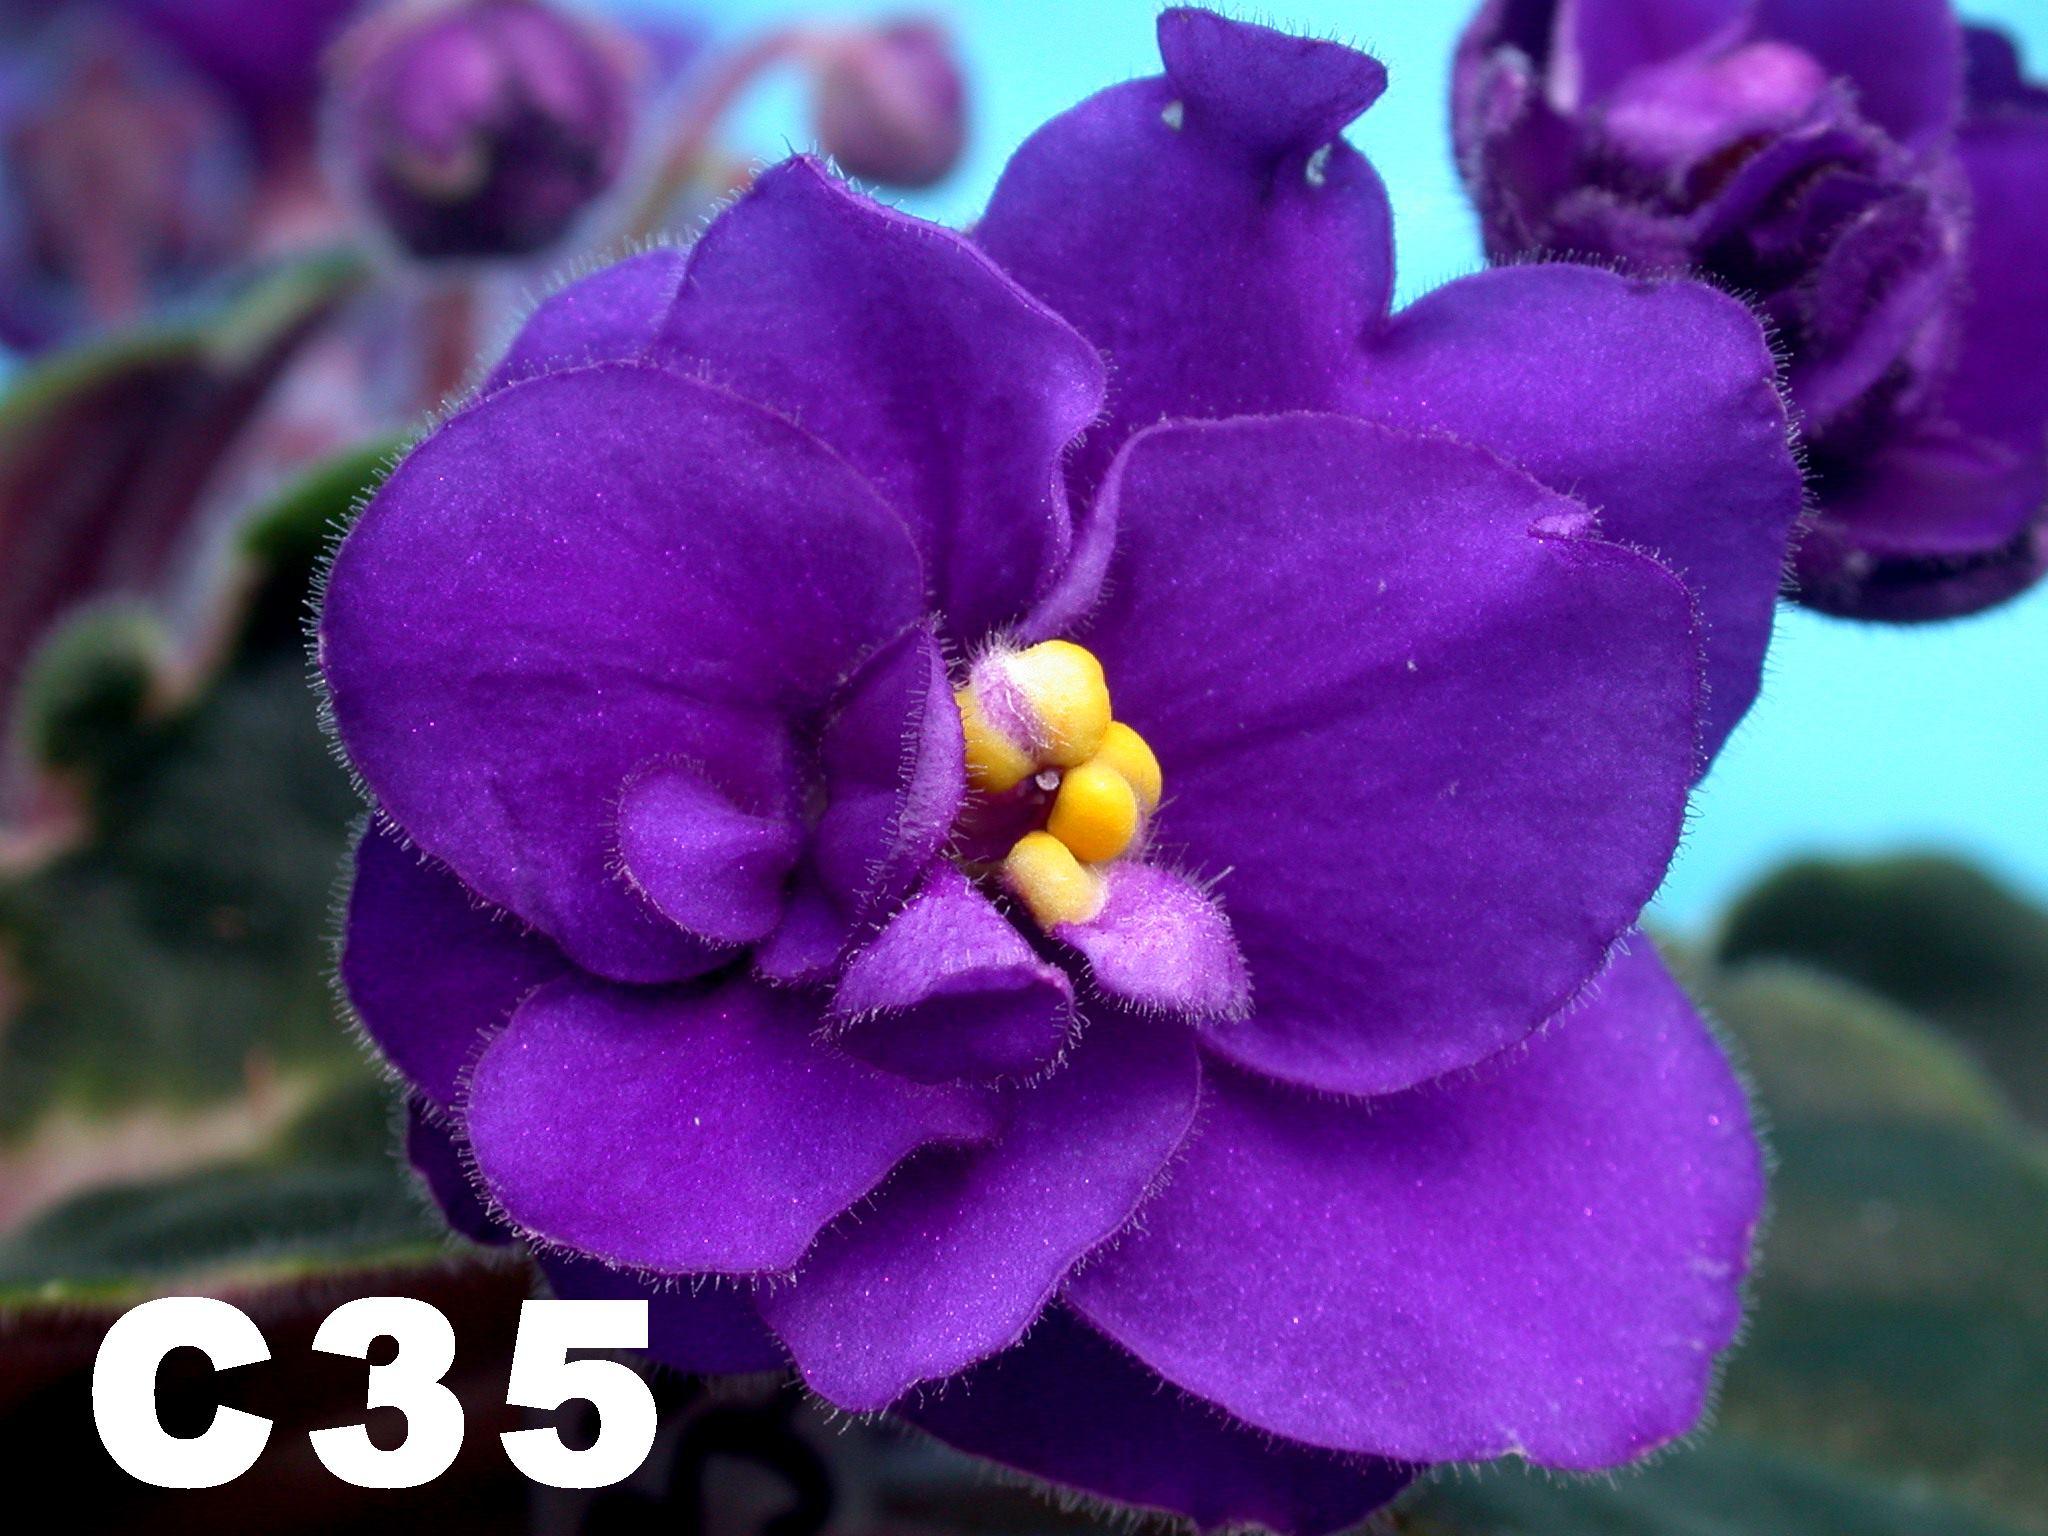 非洲紫羅蘭名錄 | African Violets Catalogue - C系列 C35